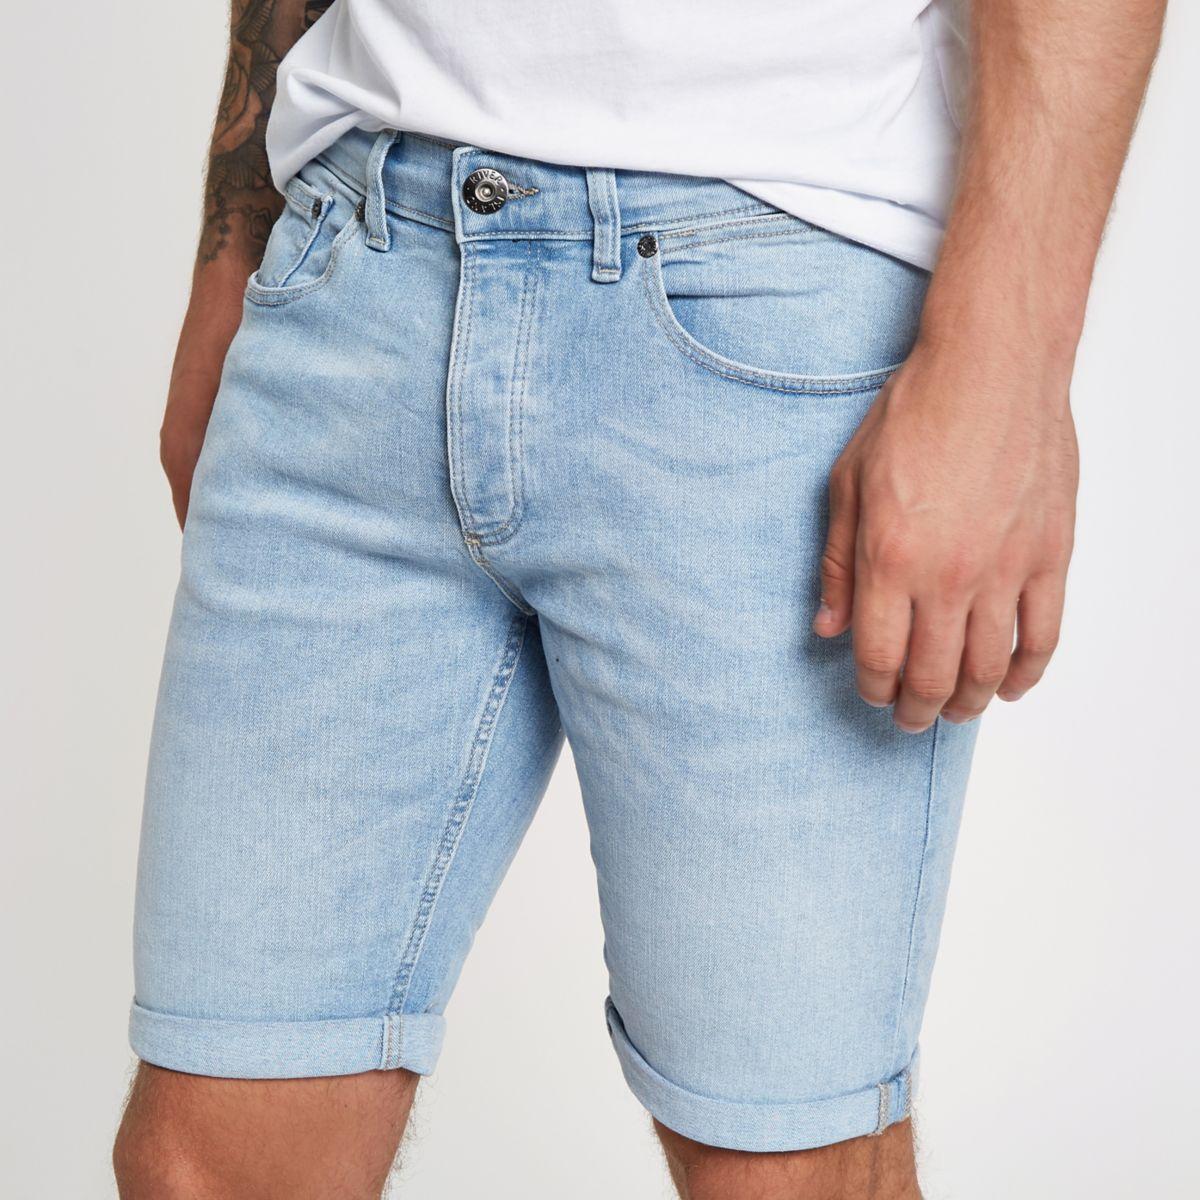 Light blue skinny denim shorts